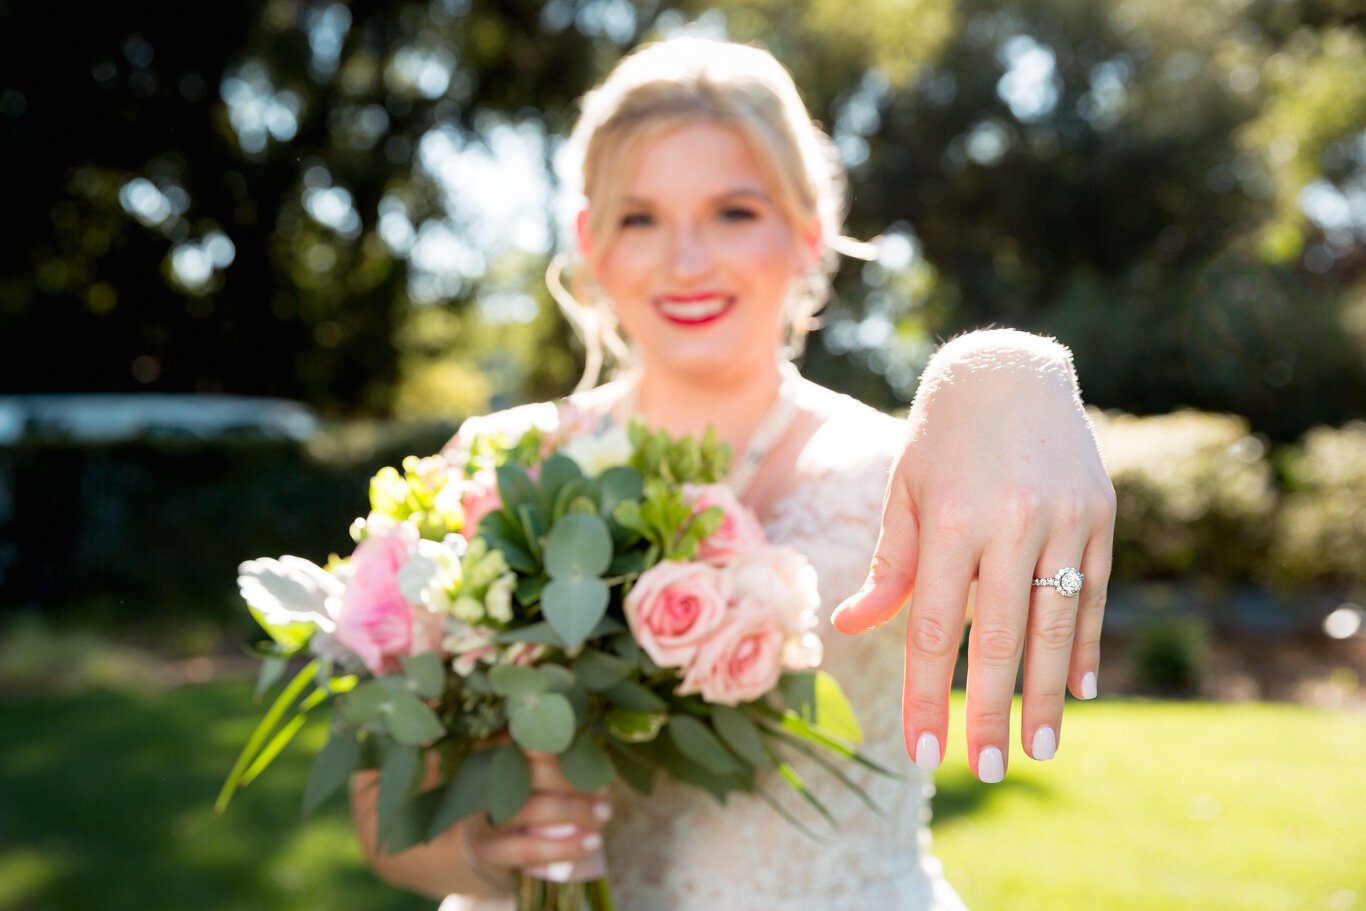 2019.08.24_Emily-Ashir-Wedding-at-the-Maples-5687.jpg